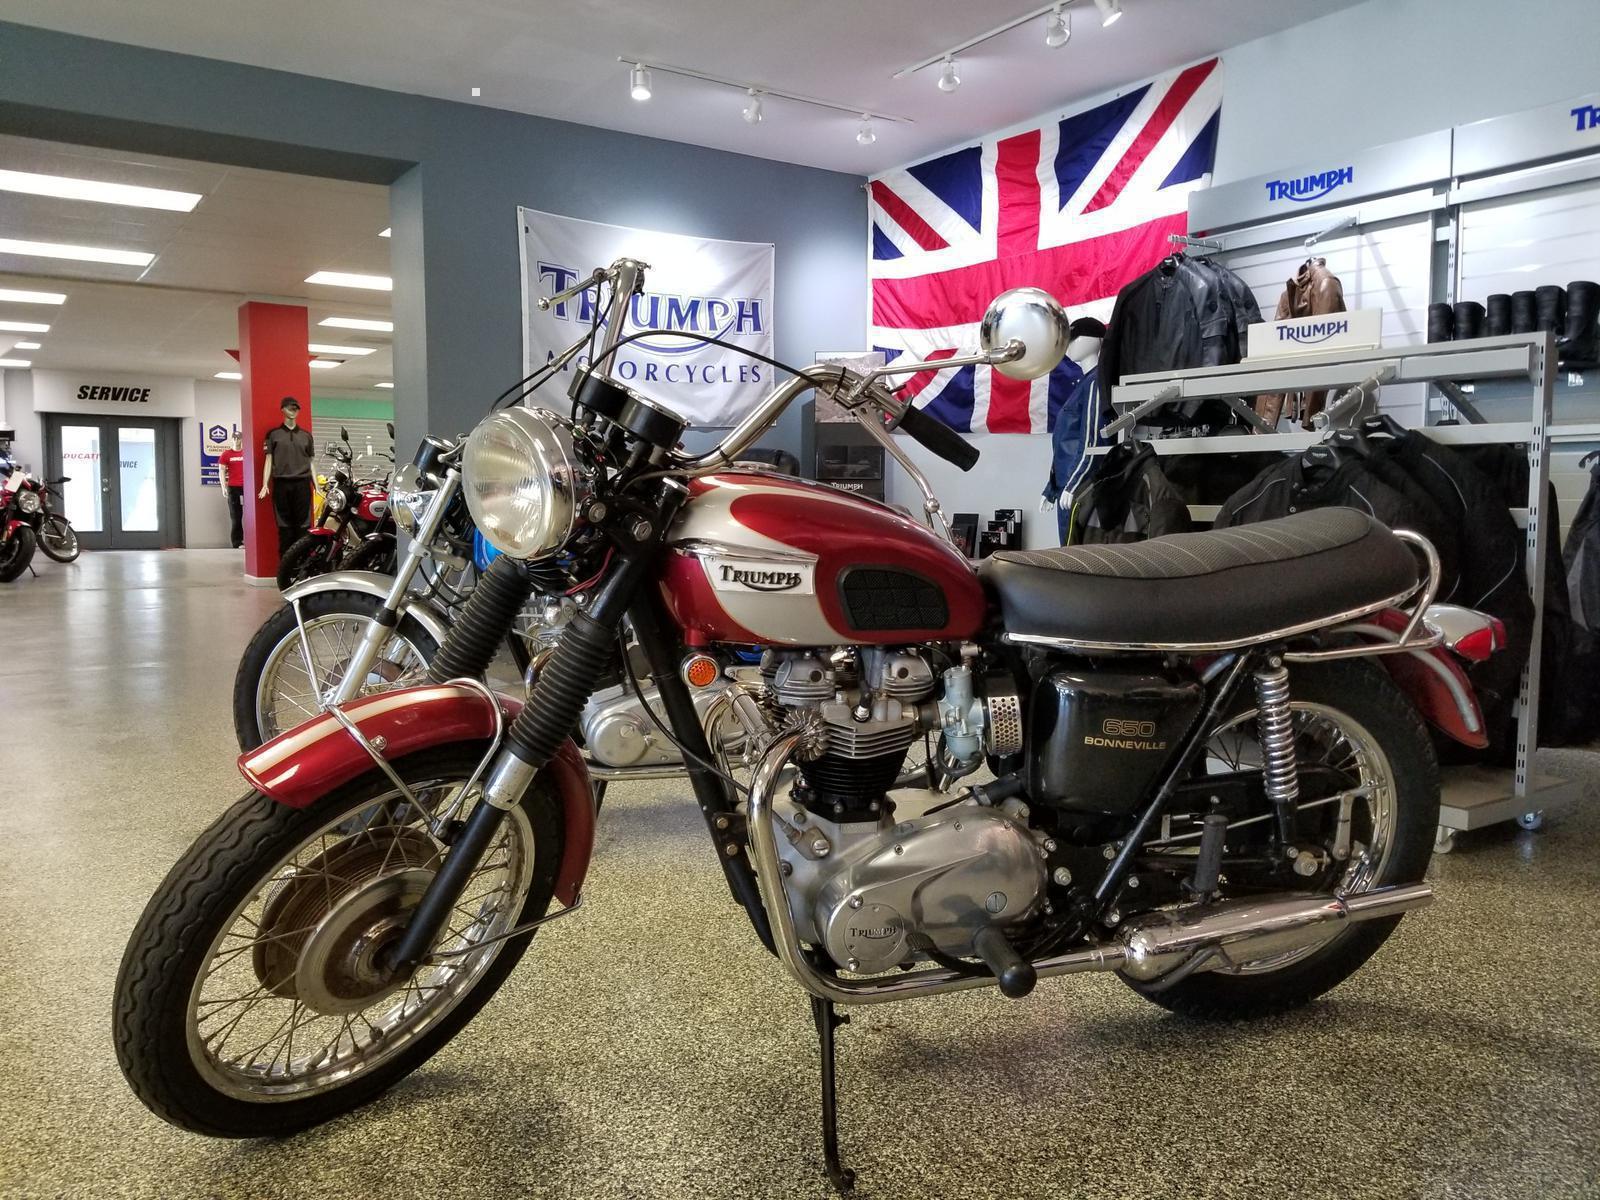 1970 Triumph T120r For Sale In Pensacola Fl Dd Cycles Inc